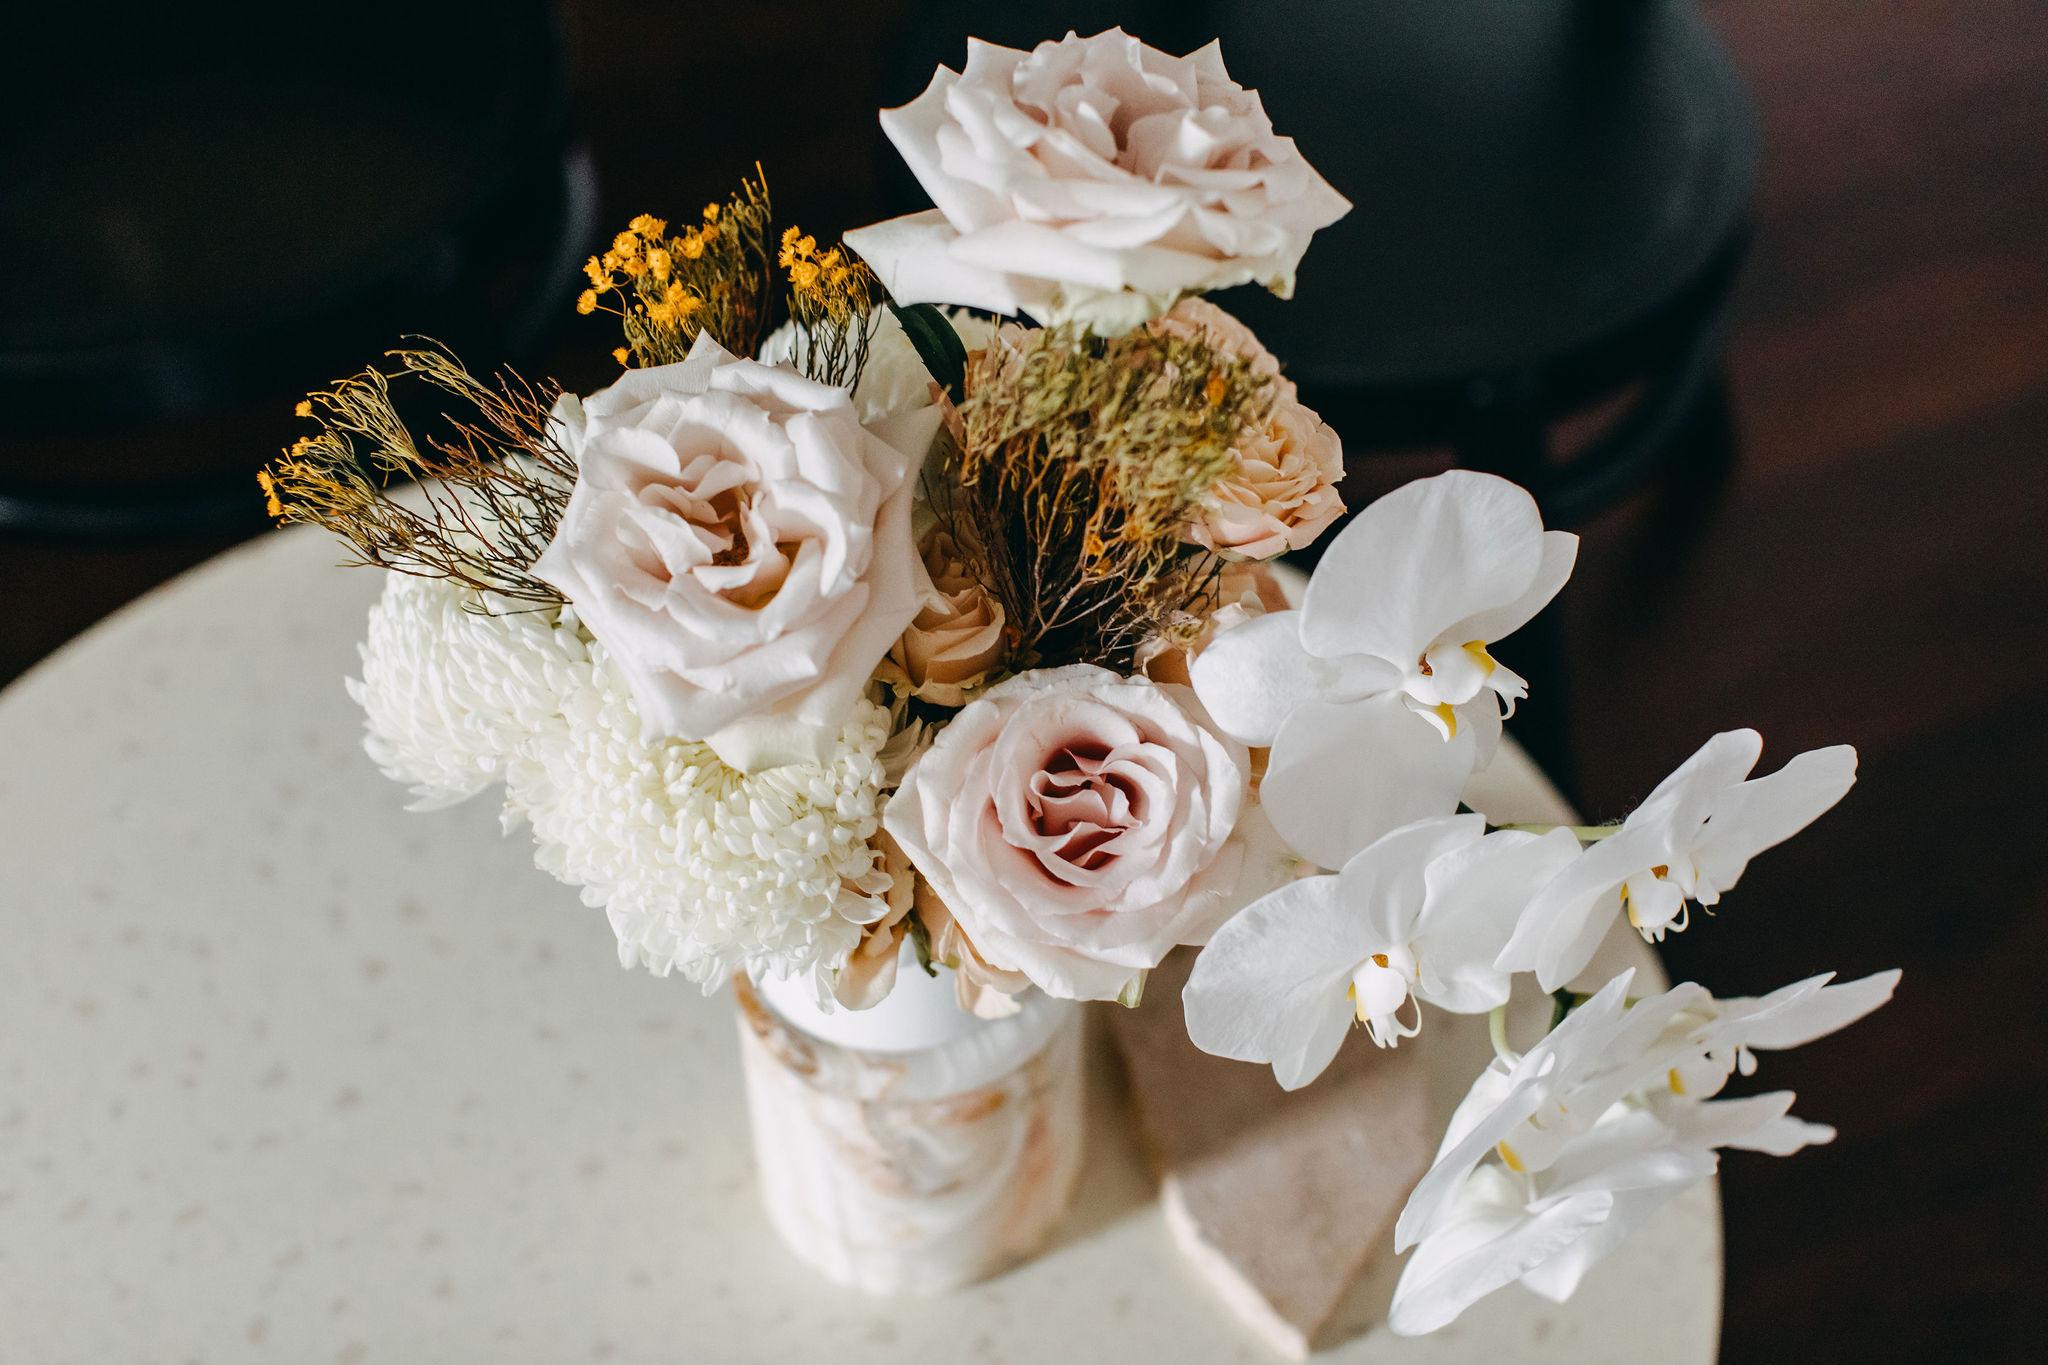 93-STATEBUILDINGS-WEDDINGOPENDAY-16FEB2020